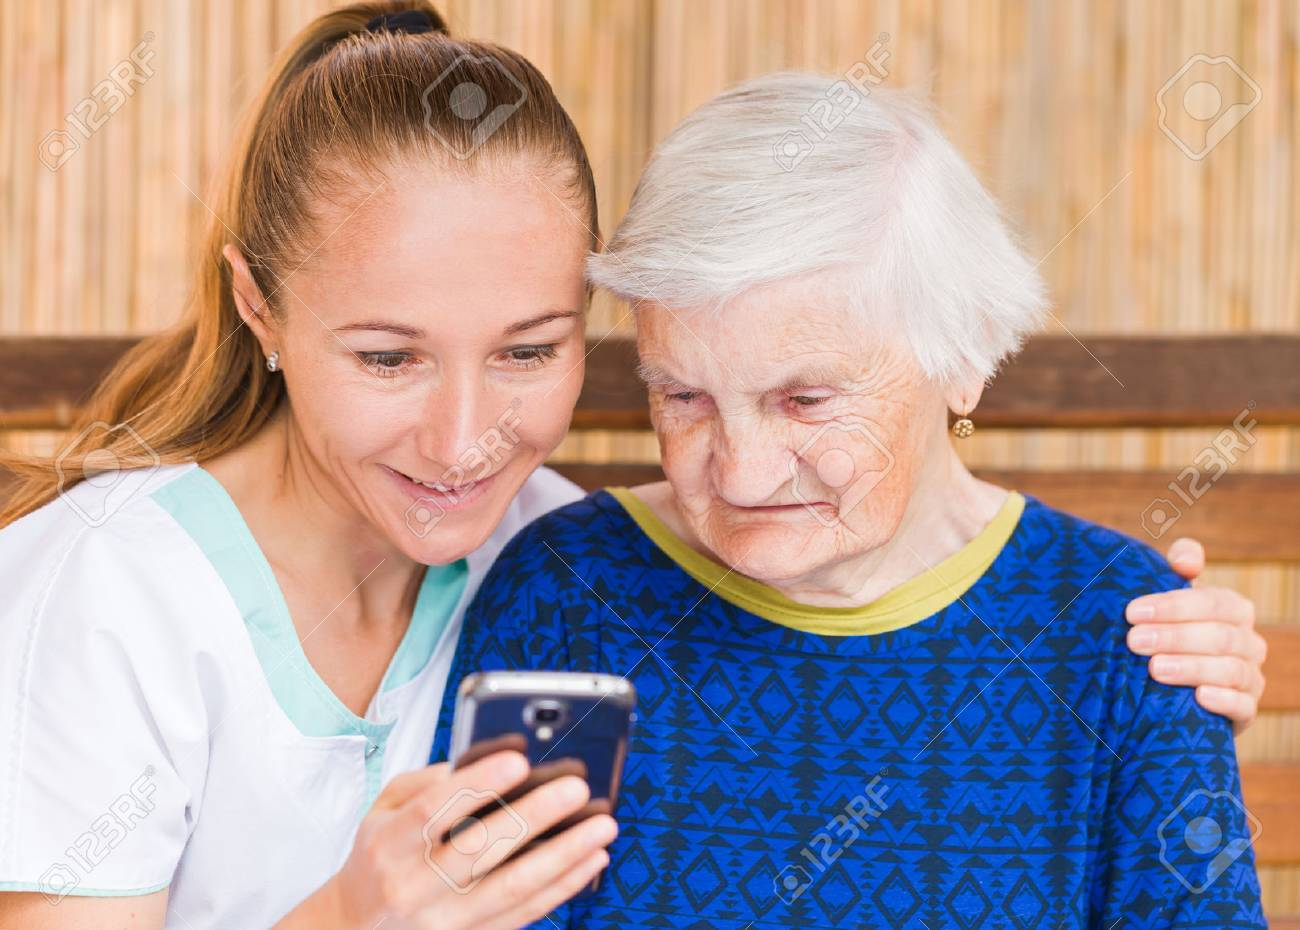 Photo of elderly woman with her caregiver Standard-Bild - 38190553